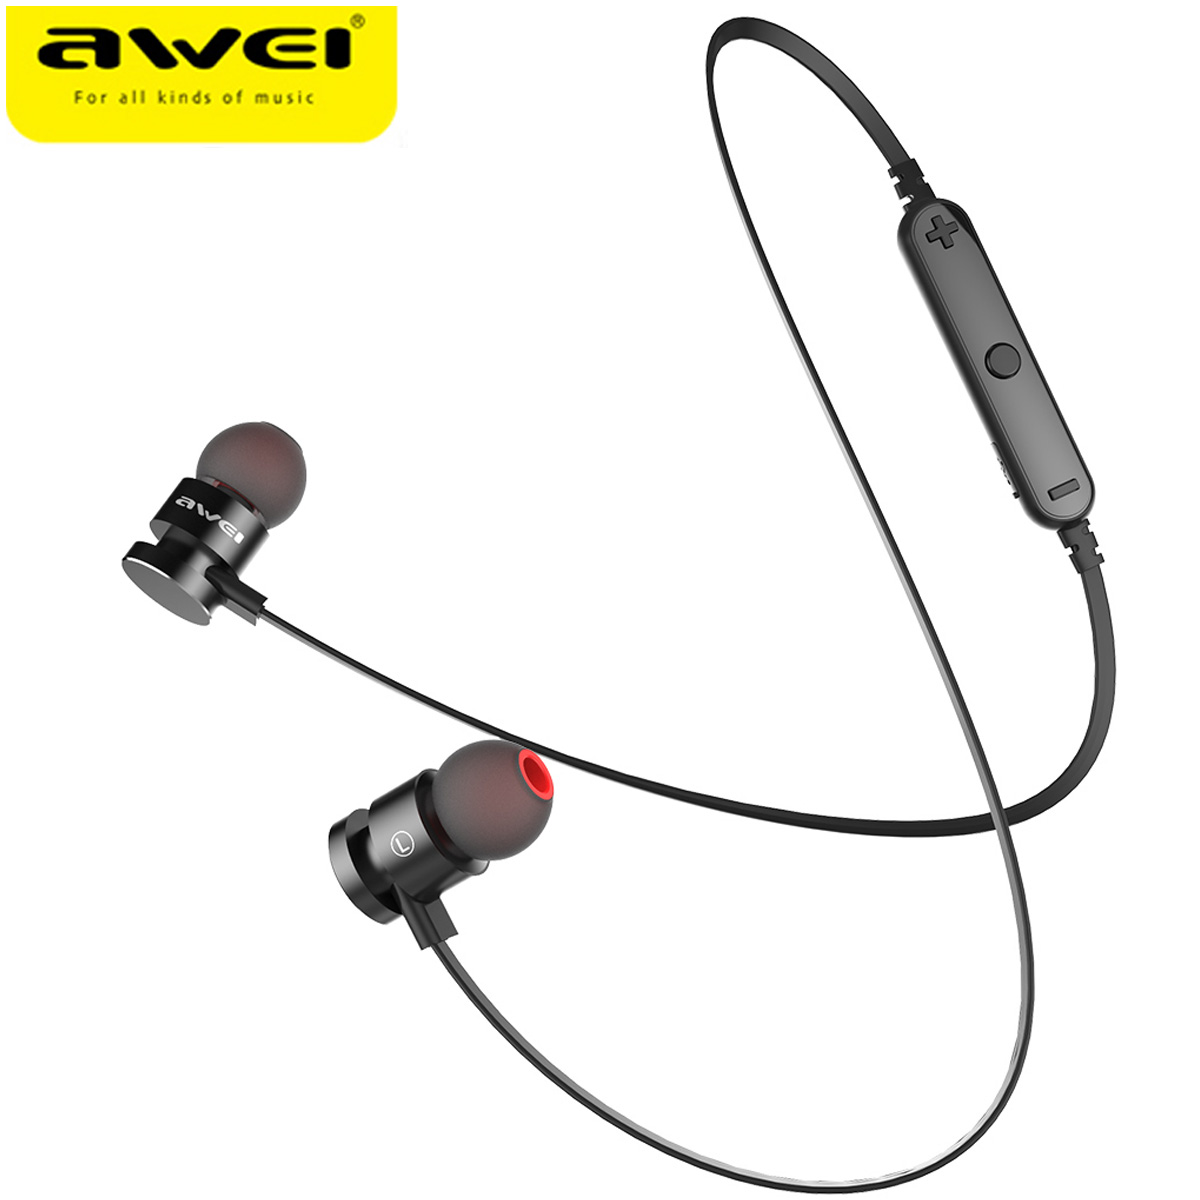 2018 neueste AWEI T11 Drahtlose Kopfhörer Bluetooth Kopfhörer Fone de ouvido Für Telefon Nackenbügel Écouteur Auriculares Bluetooth V4.2